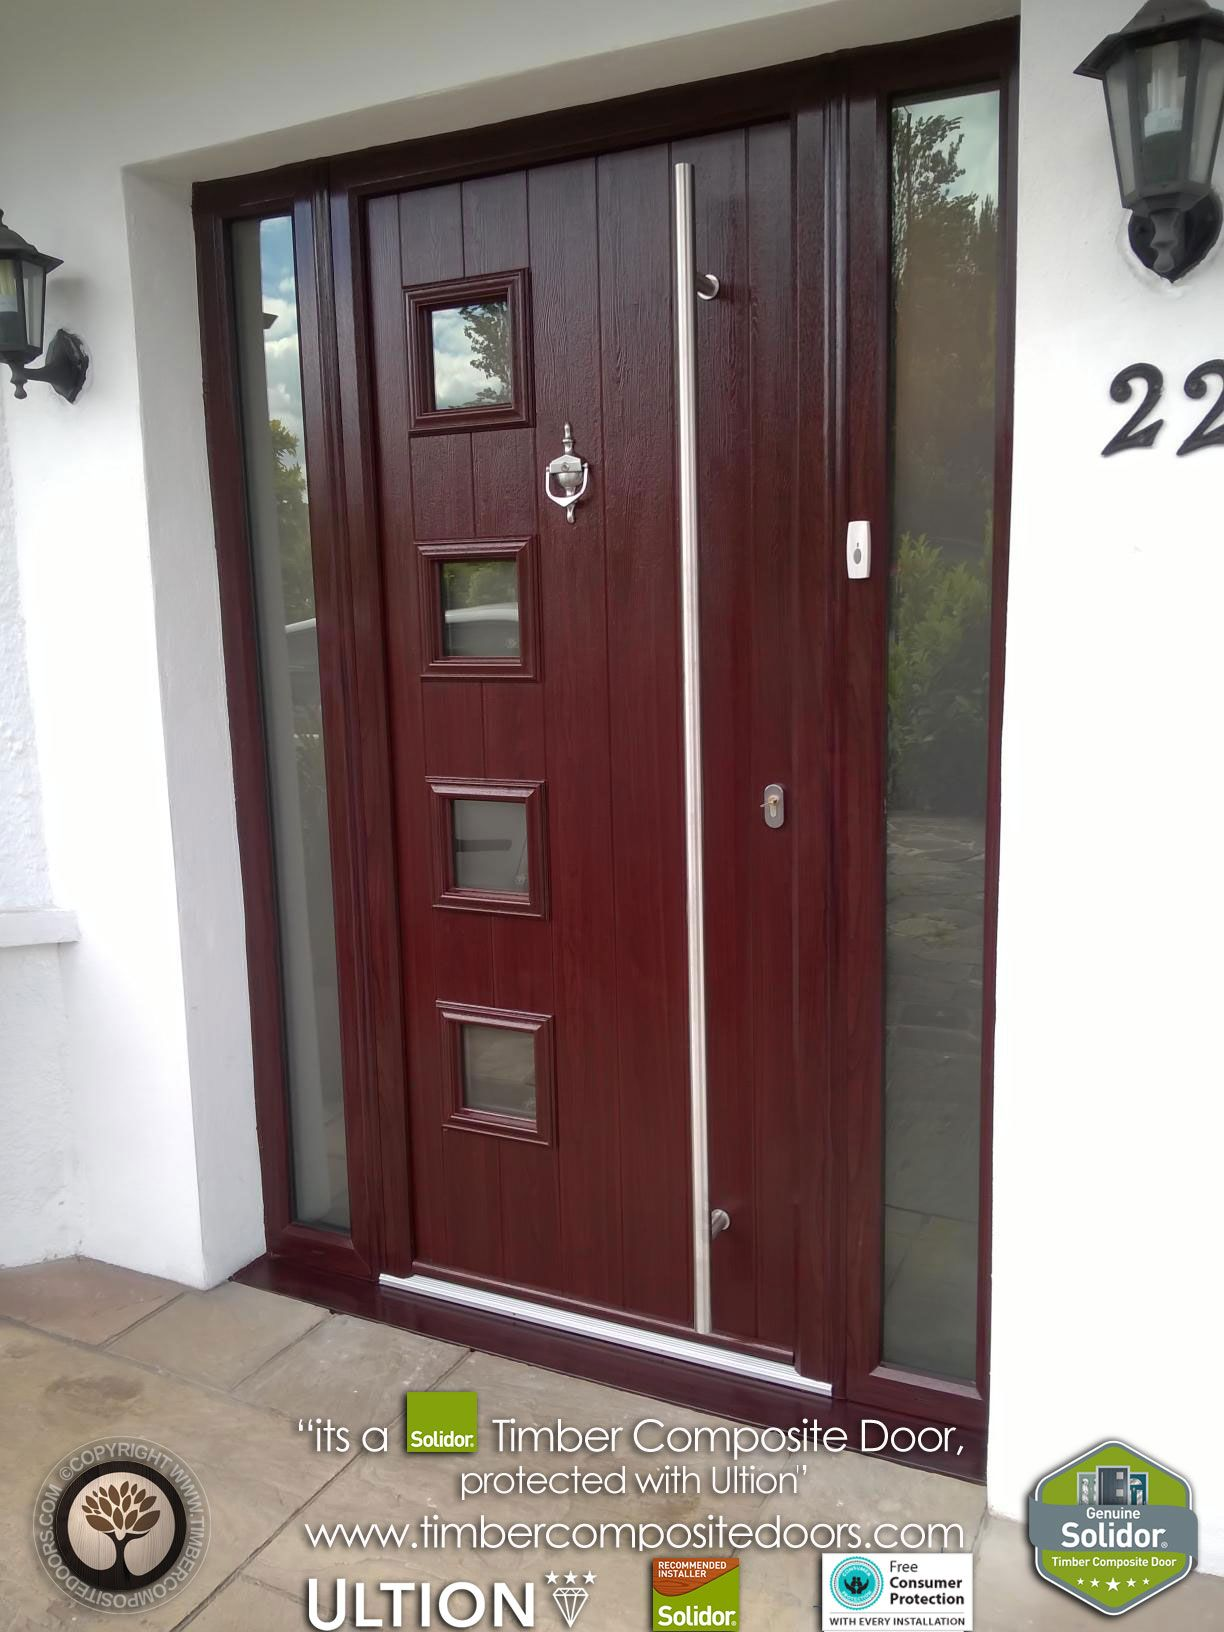 Pin On Solidor Composite Door Images